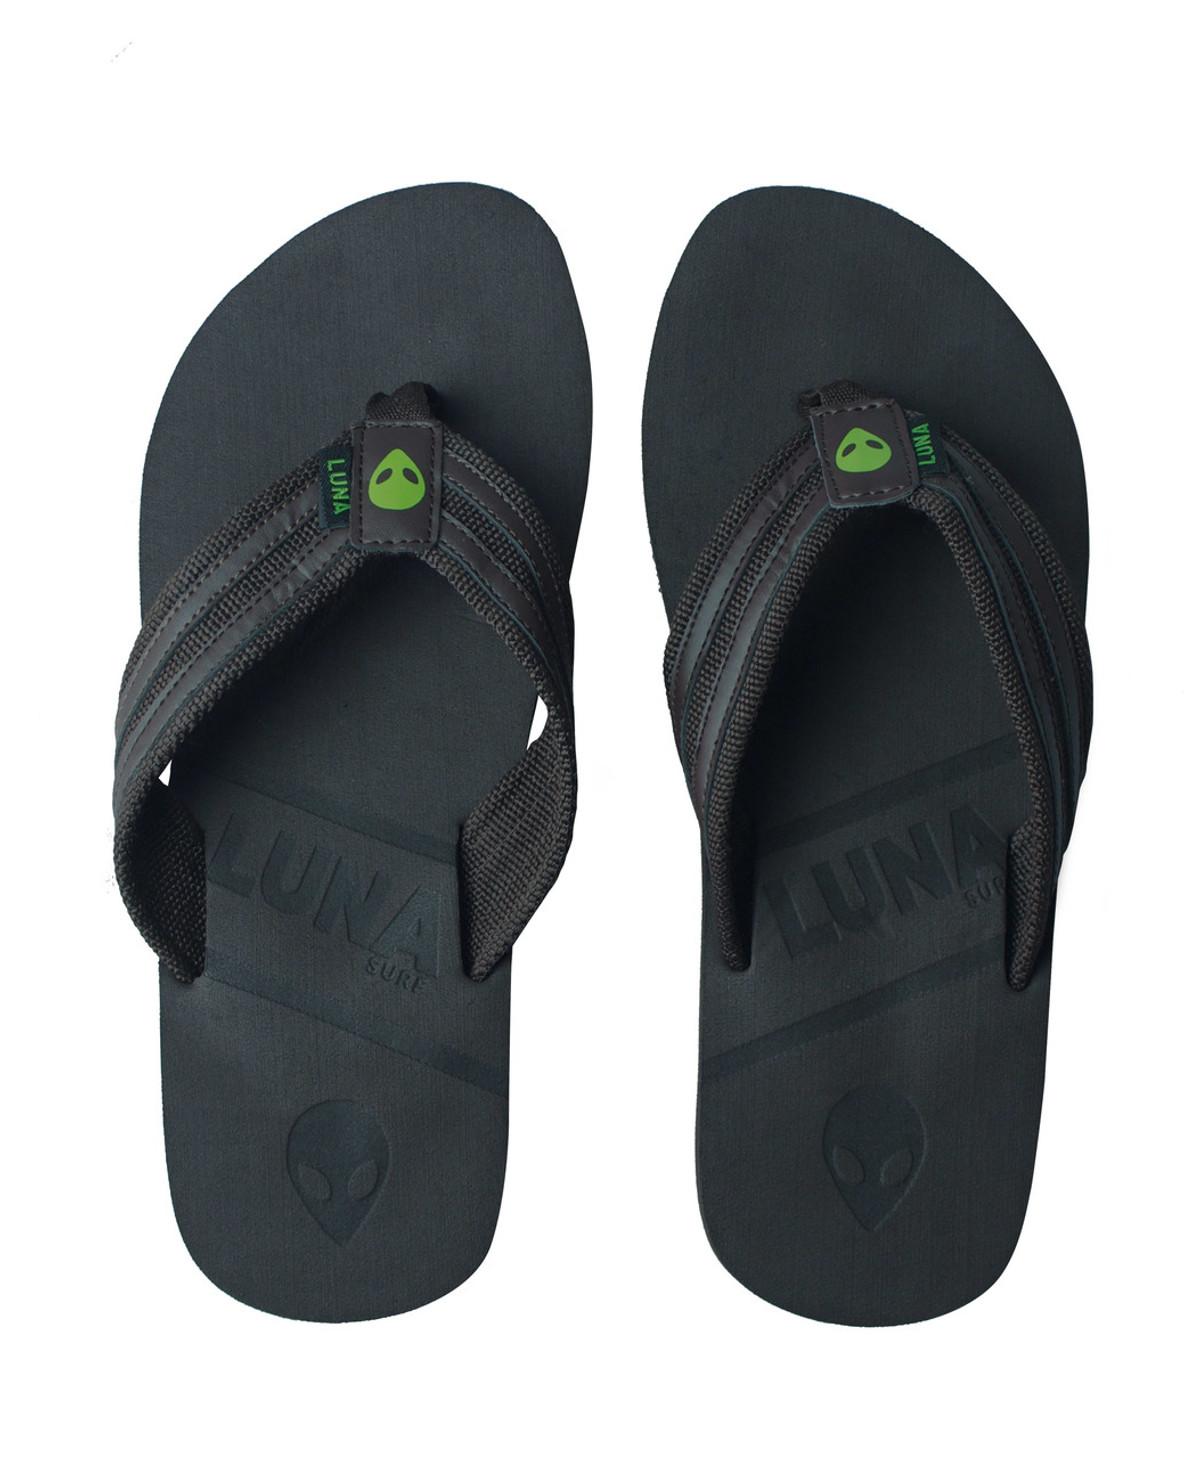 66111c209d434 Lunasurf Flip Flops Brown Green